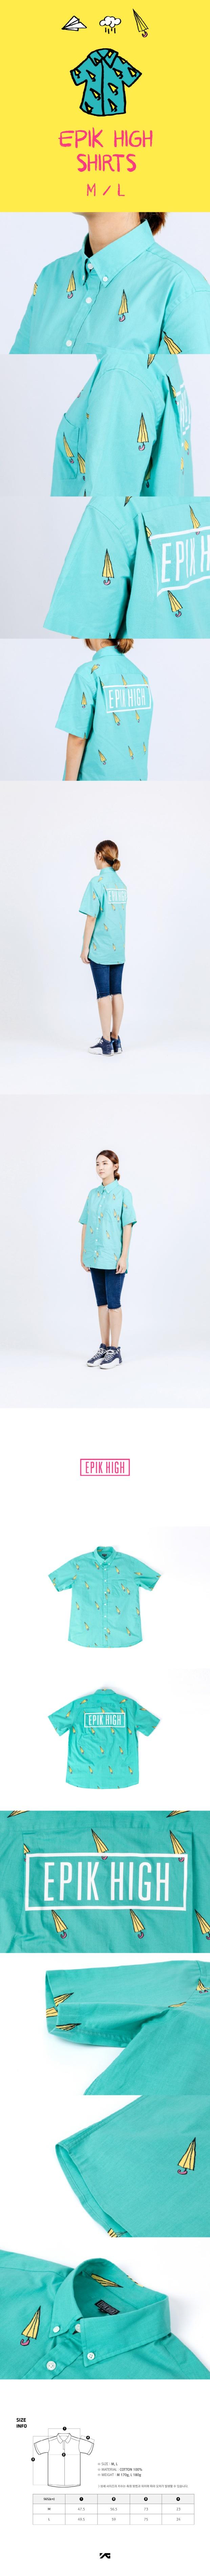 02_shirts_01